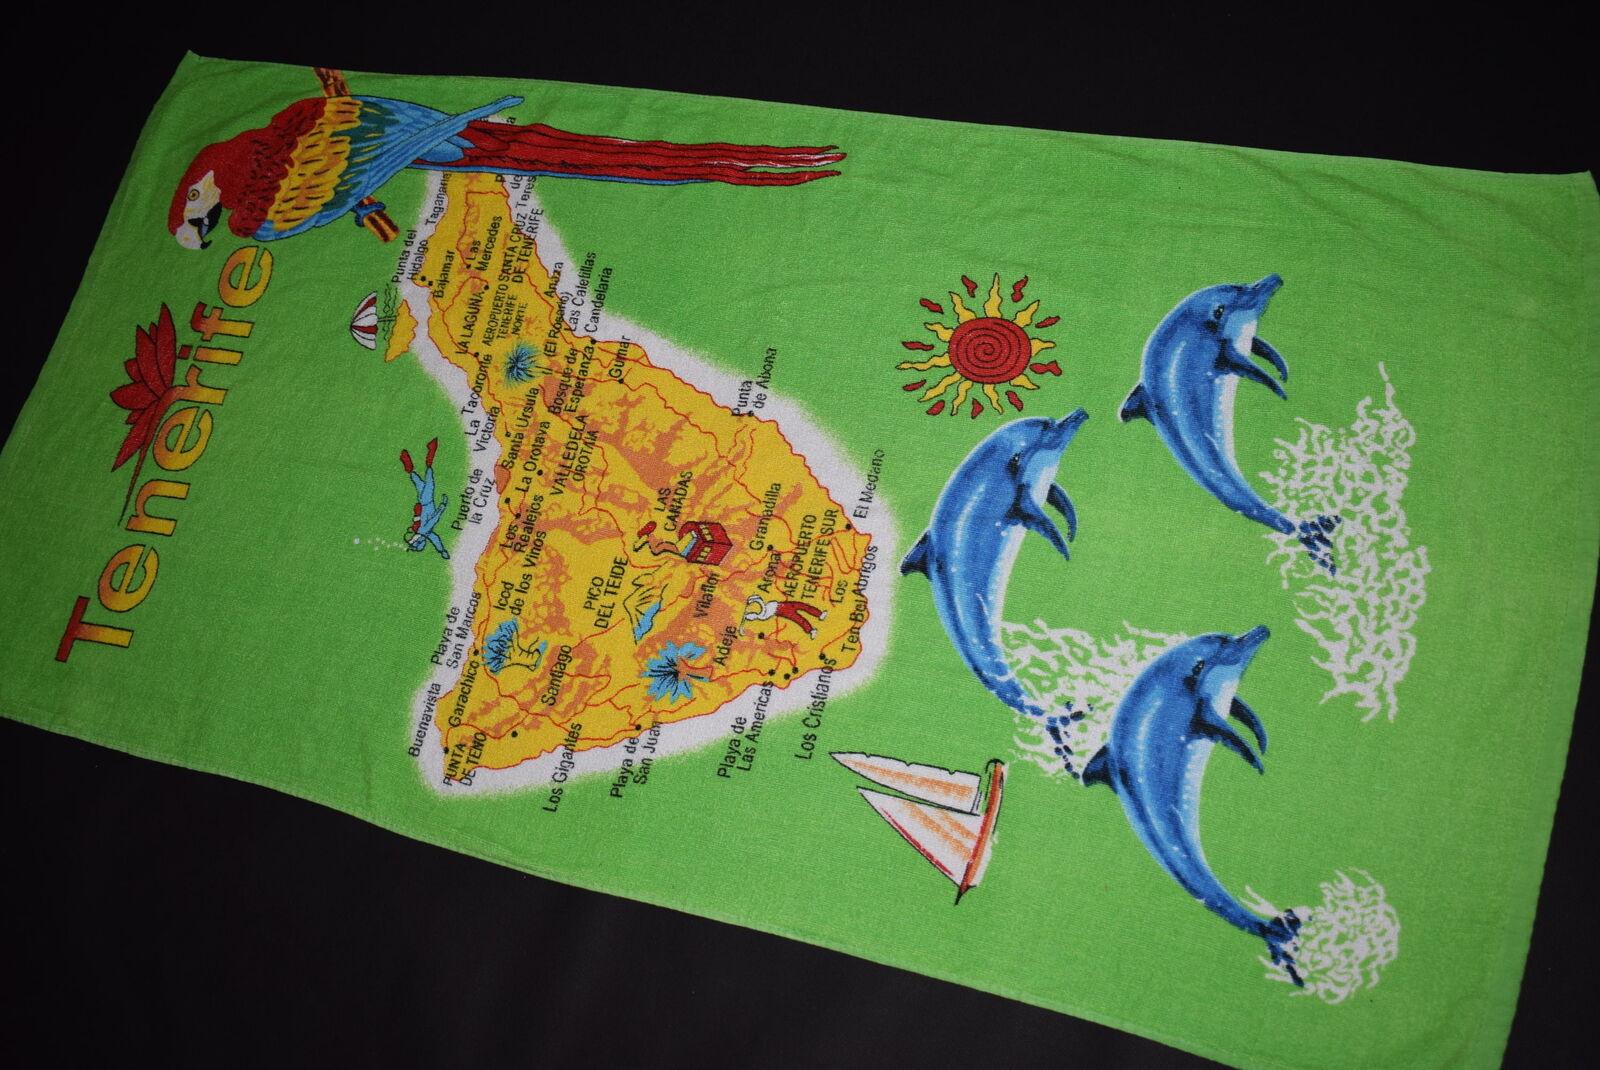 Tenerife Beach Towel Beach Towel Comic Graphic Summer Tenerife Vintage 140x75-show original title